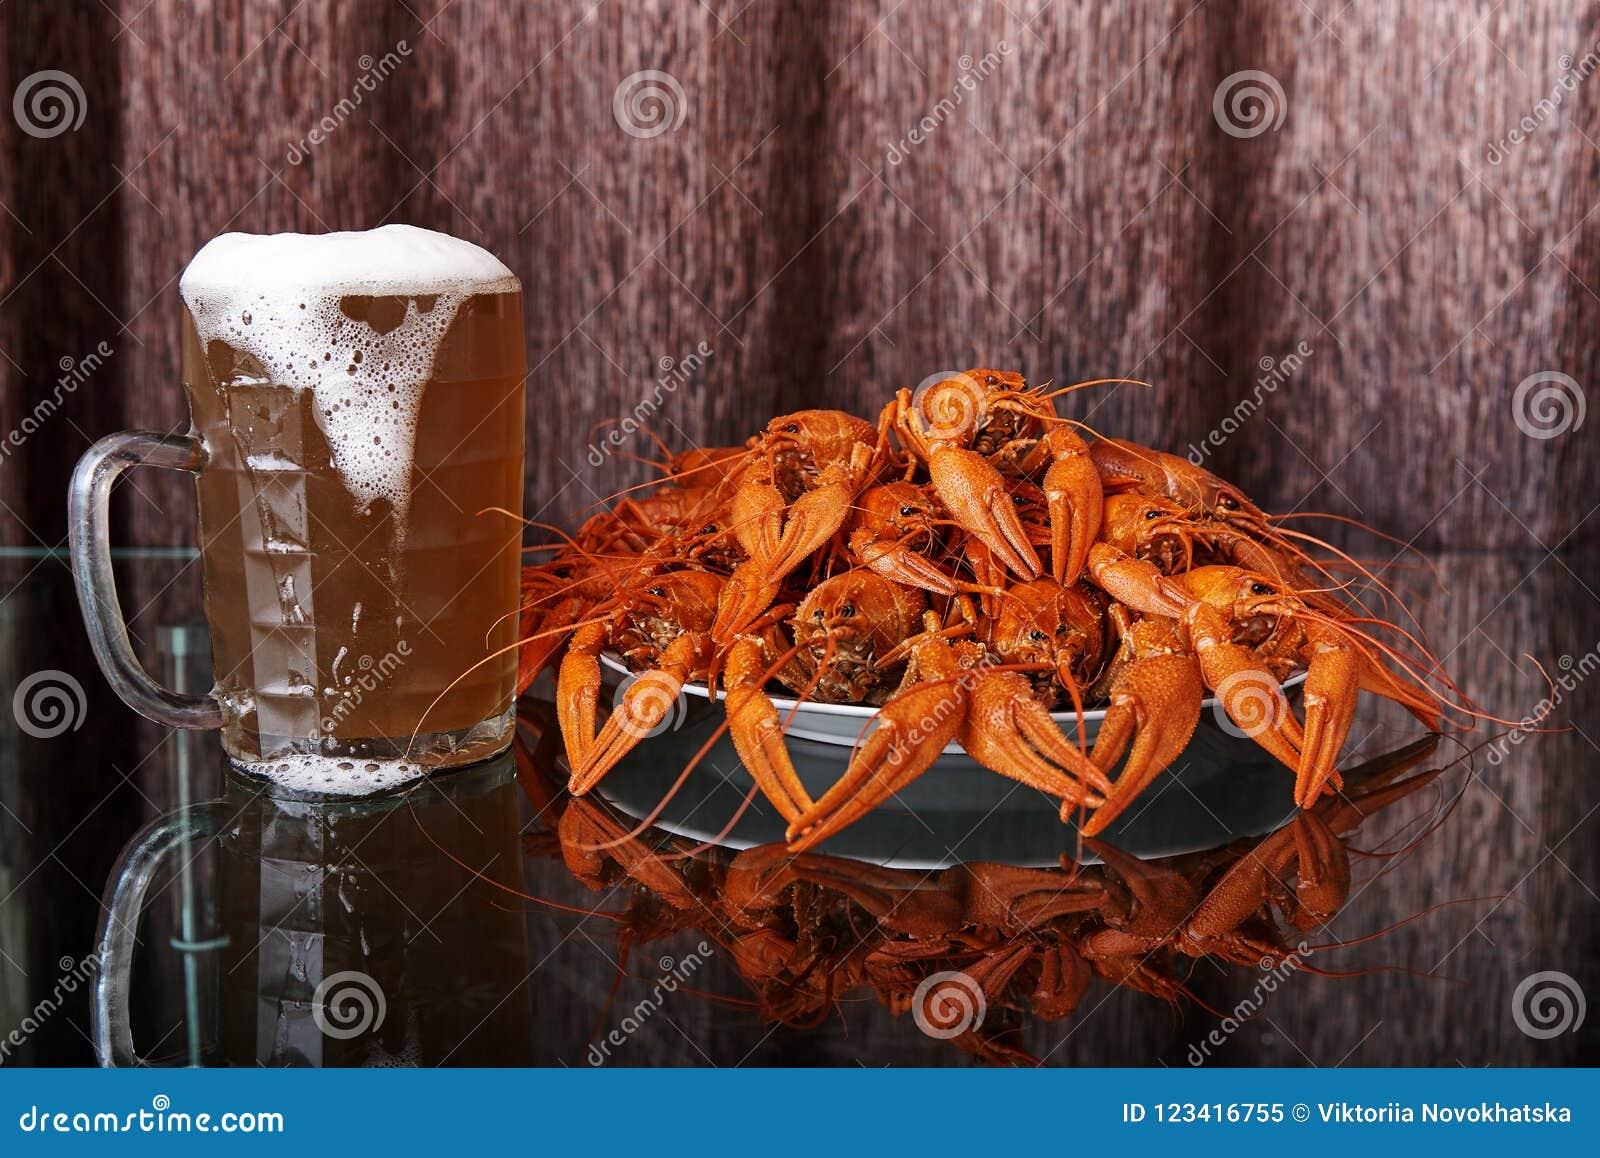 Gekookte rivierkreeften en mok met koud bier